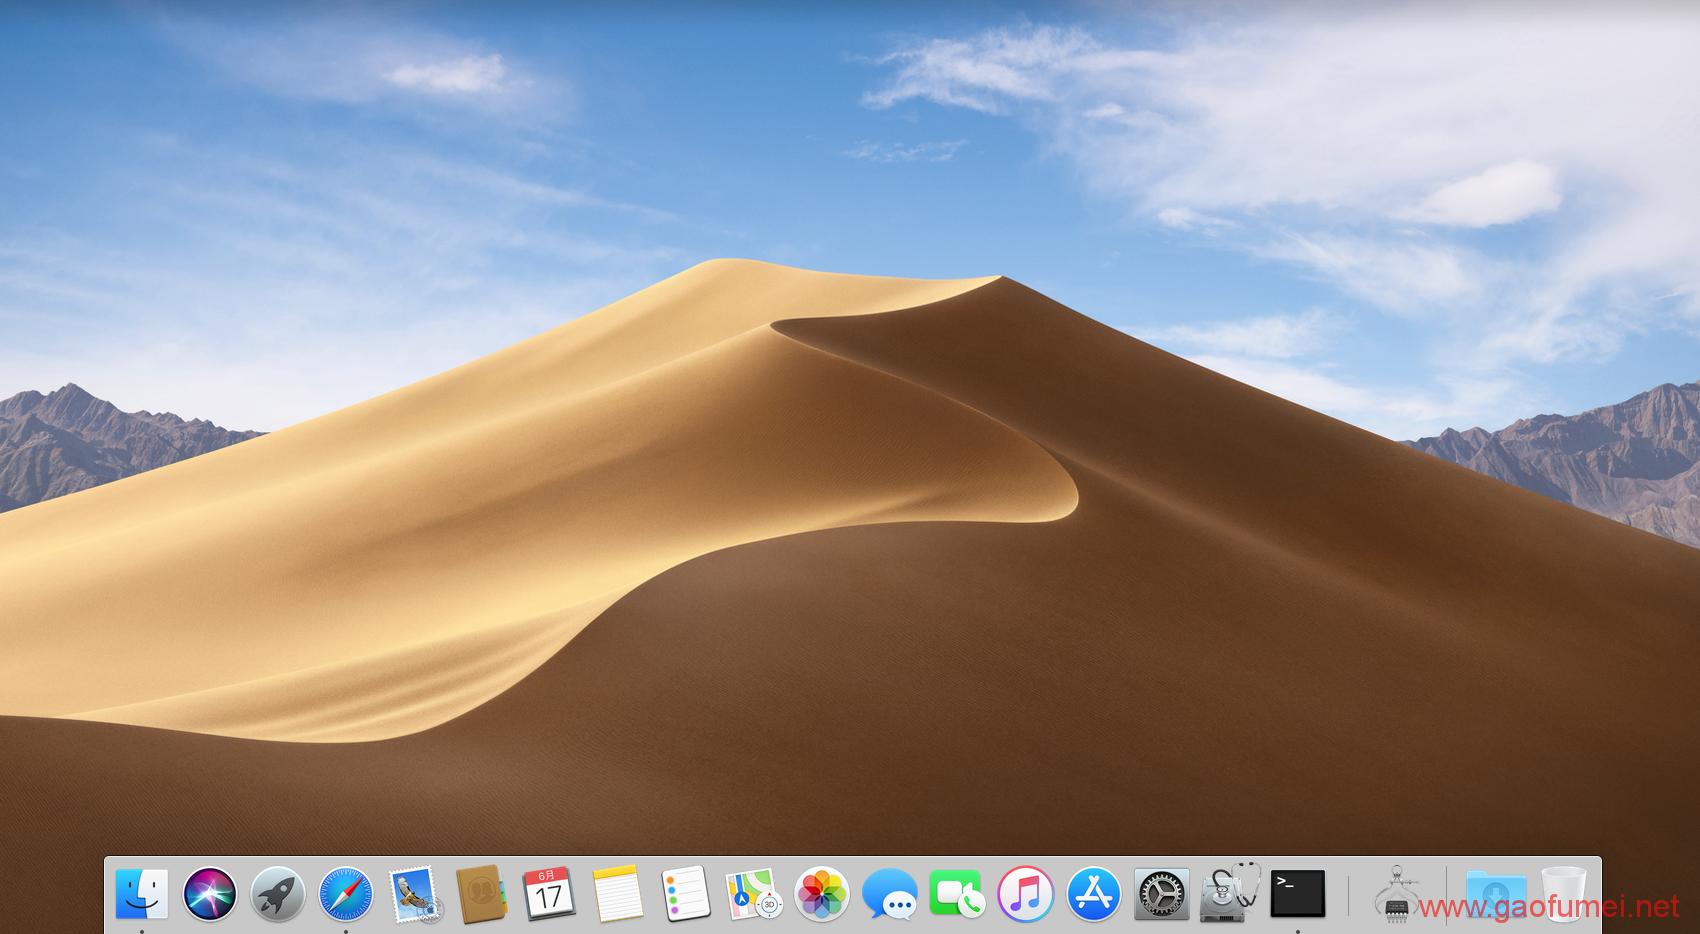 Mac OS Catalina 10.15.4 CDR版黑苹果系统分享,直链下载,无需任何密码 (最后更新时间:2020.06.19)